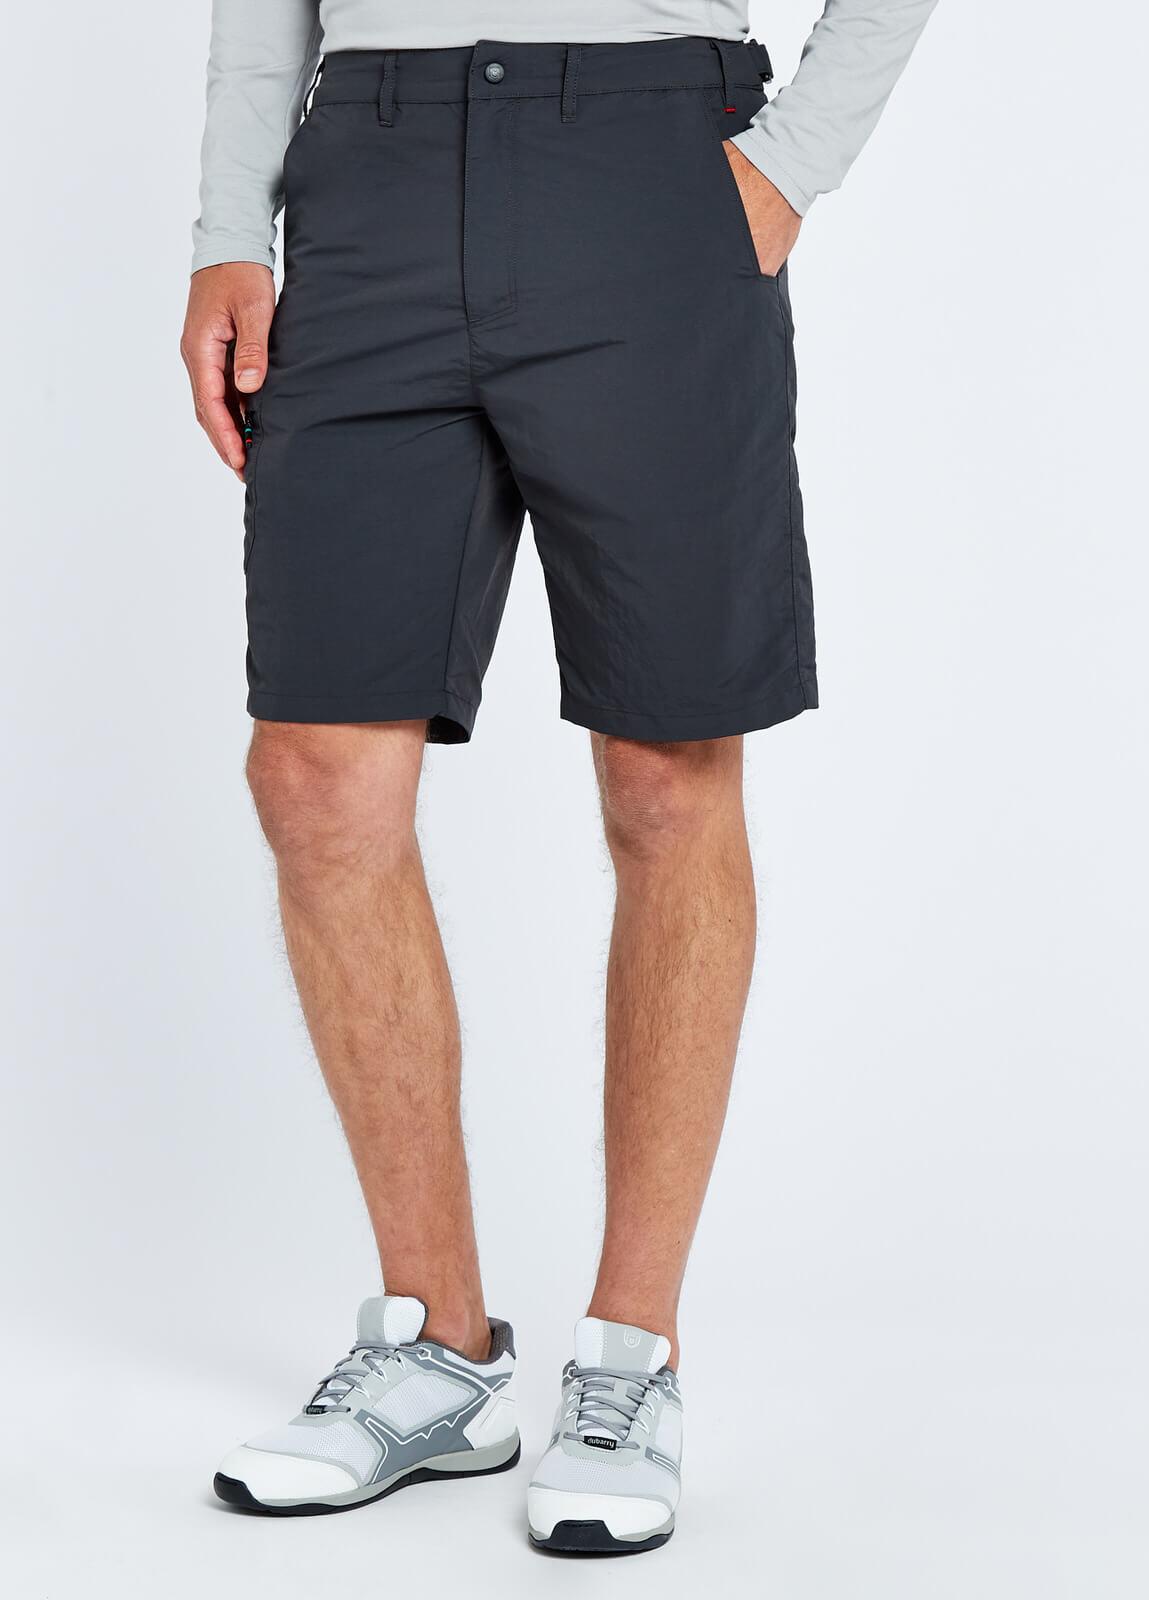 Cyprus Mens Crew Shorts - Graphite